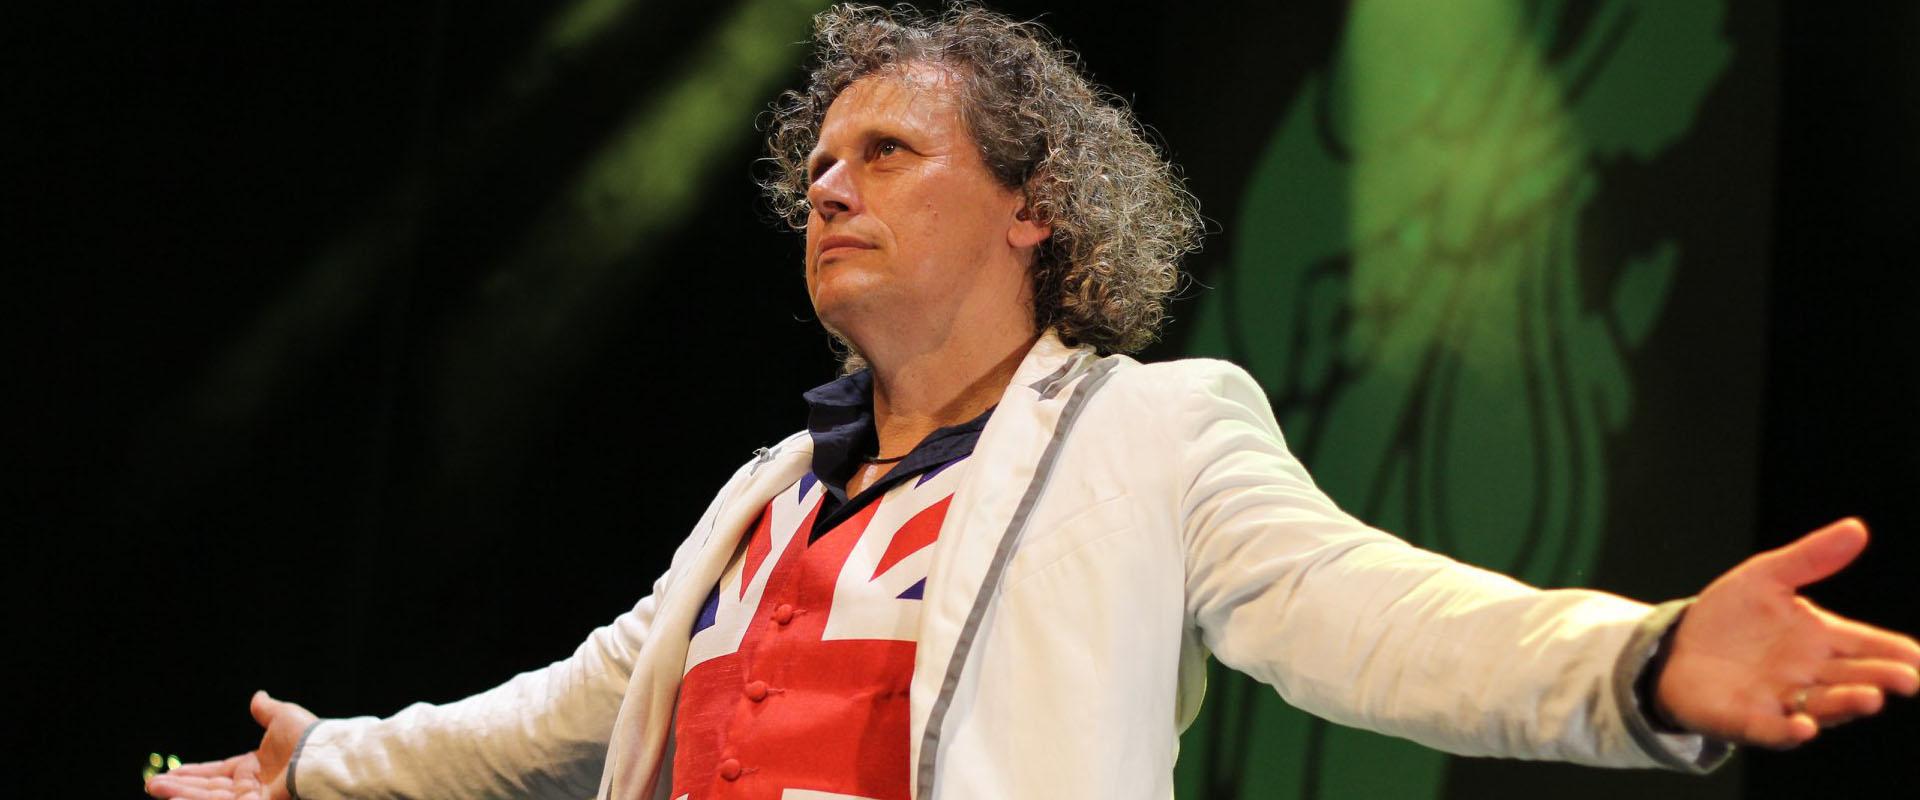 Syb van der Ploeg The Best of Britain